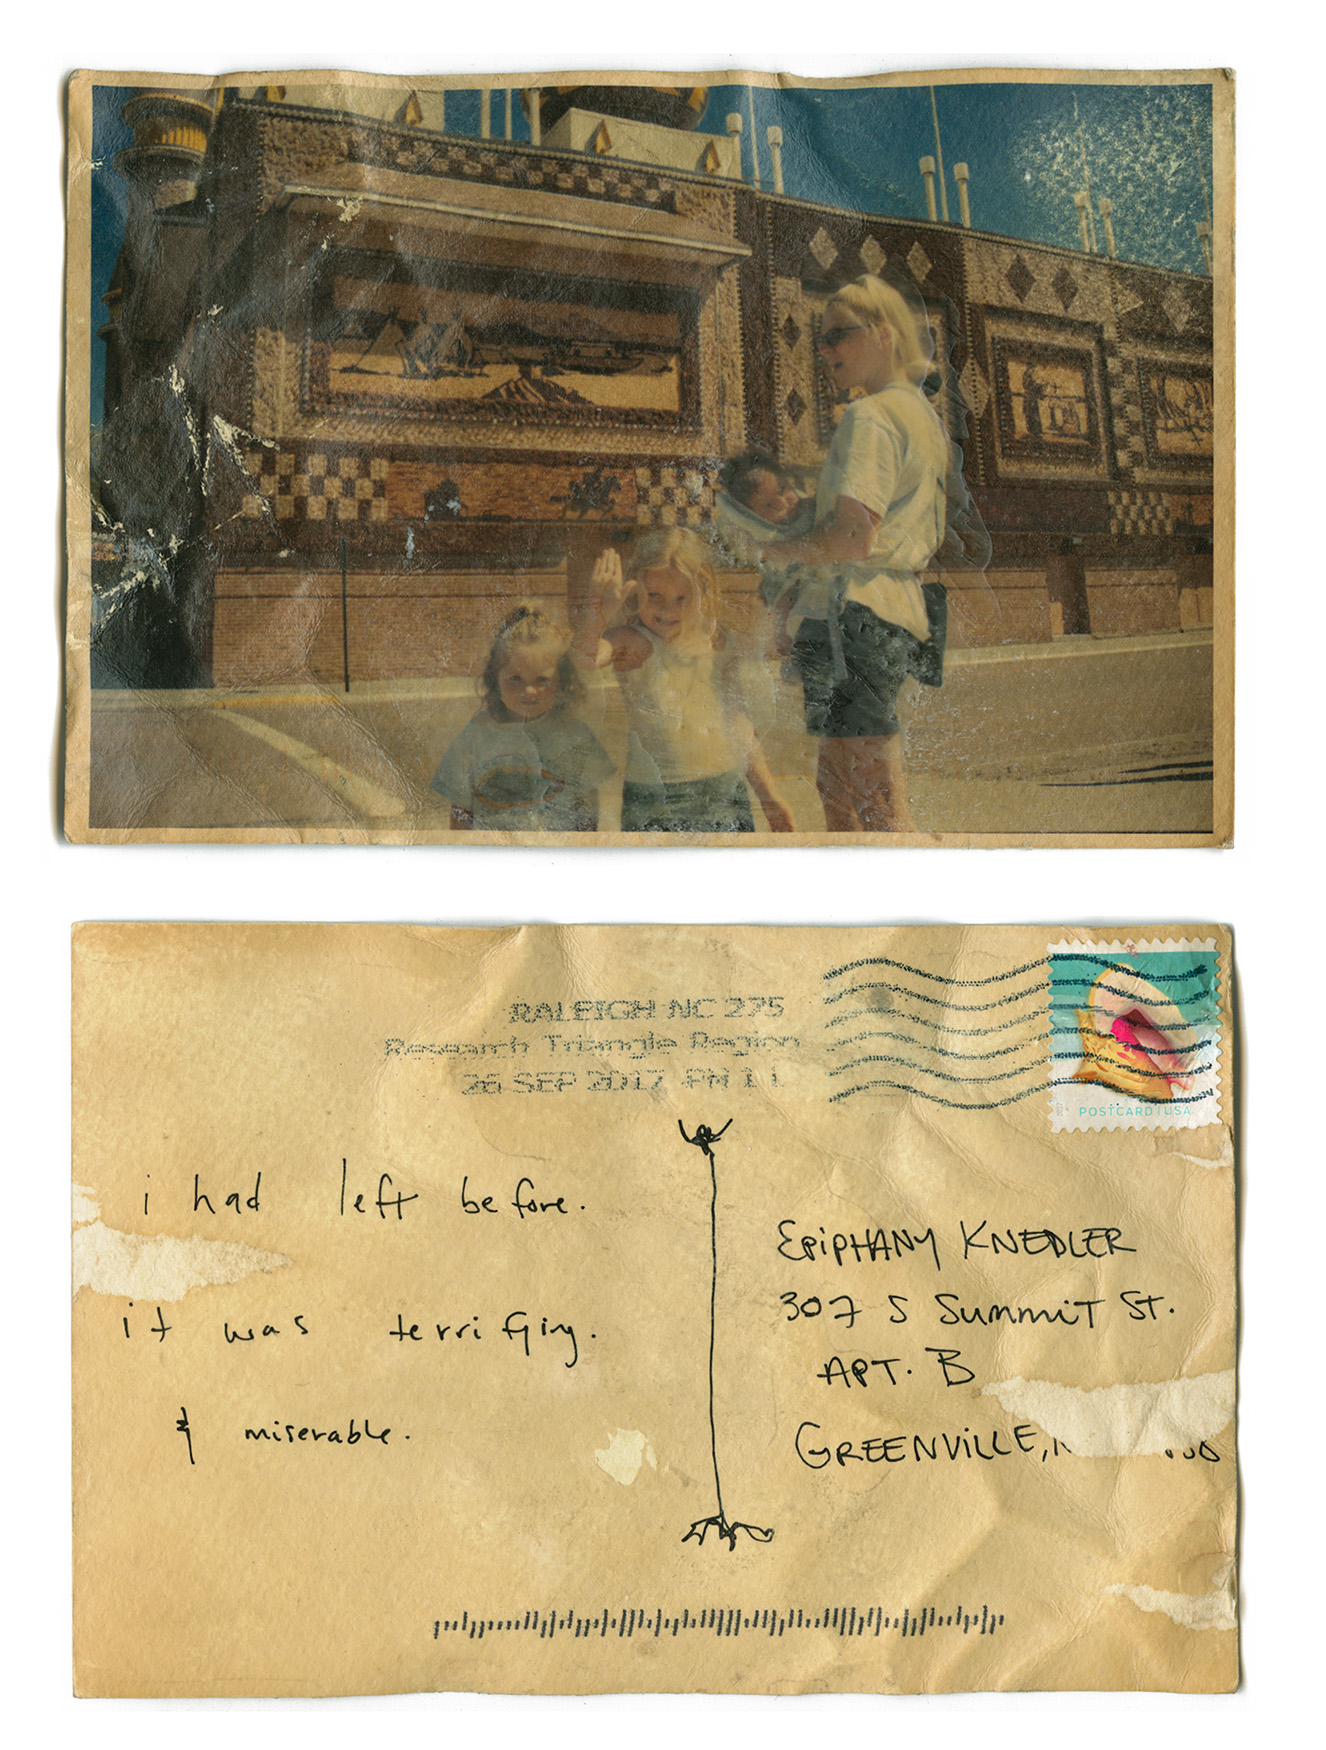 Postcard #1